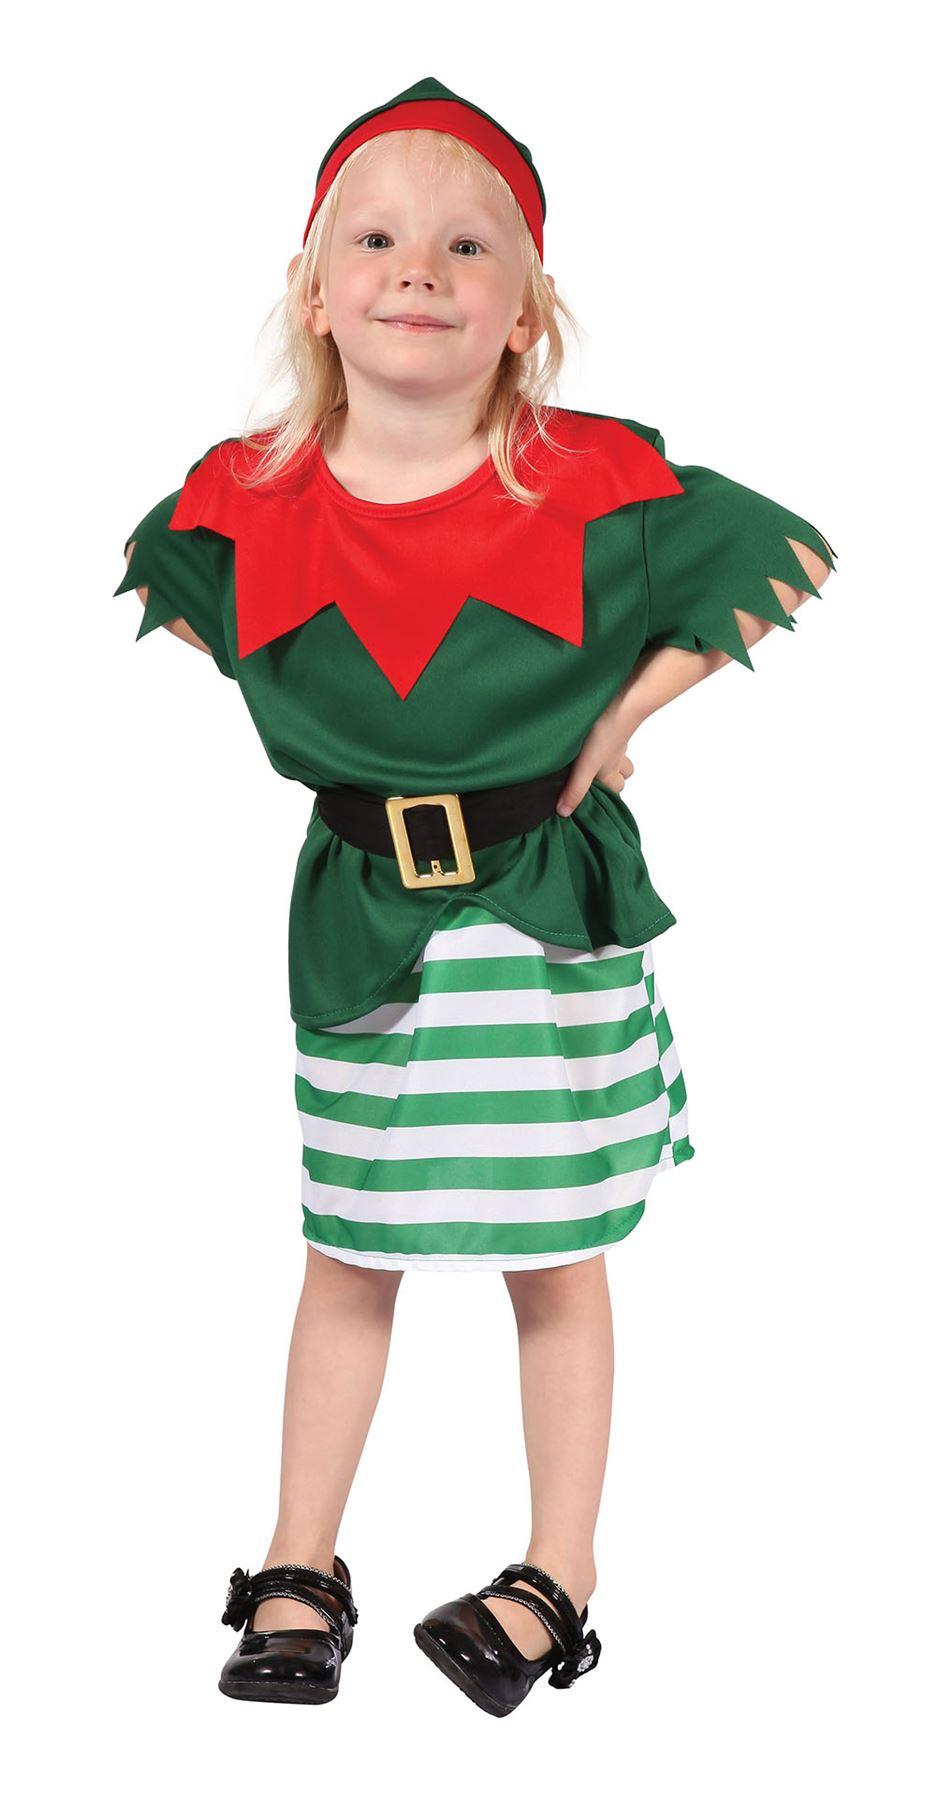 Kids-Toddler-Elf-Costume-Girls-Santas-Little-Helper-  sc 1 st  eBay & Kids Toddler Elf Costume Girls Santas Little Helper Christmas Fancy ...